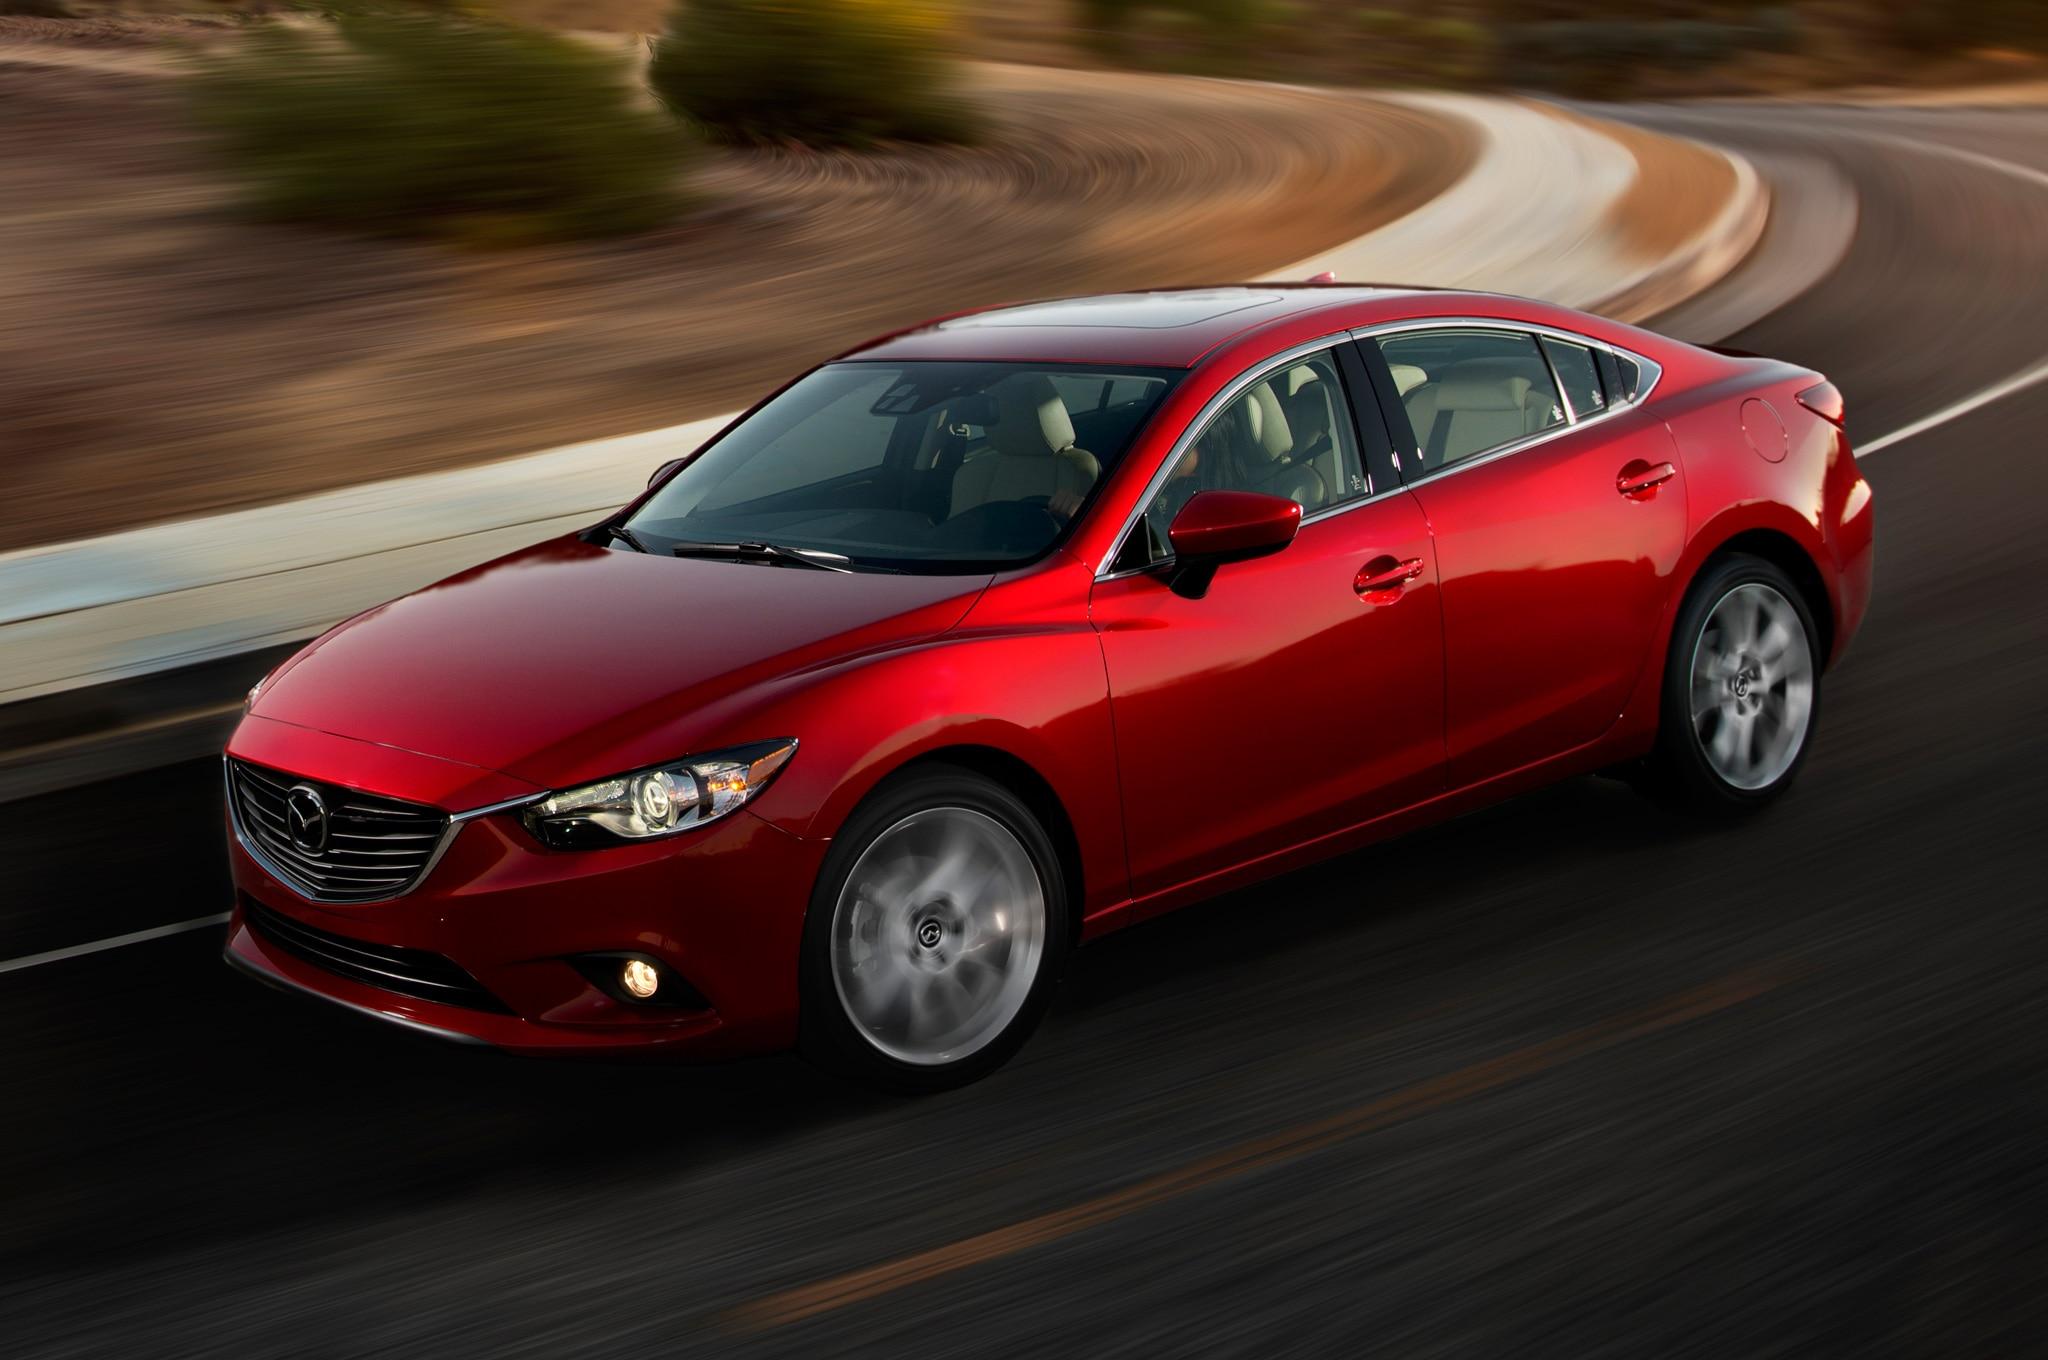 2014 Mazda6 Sedan Front Three Quarters View In Corner1